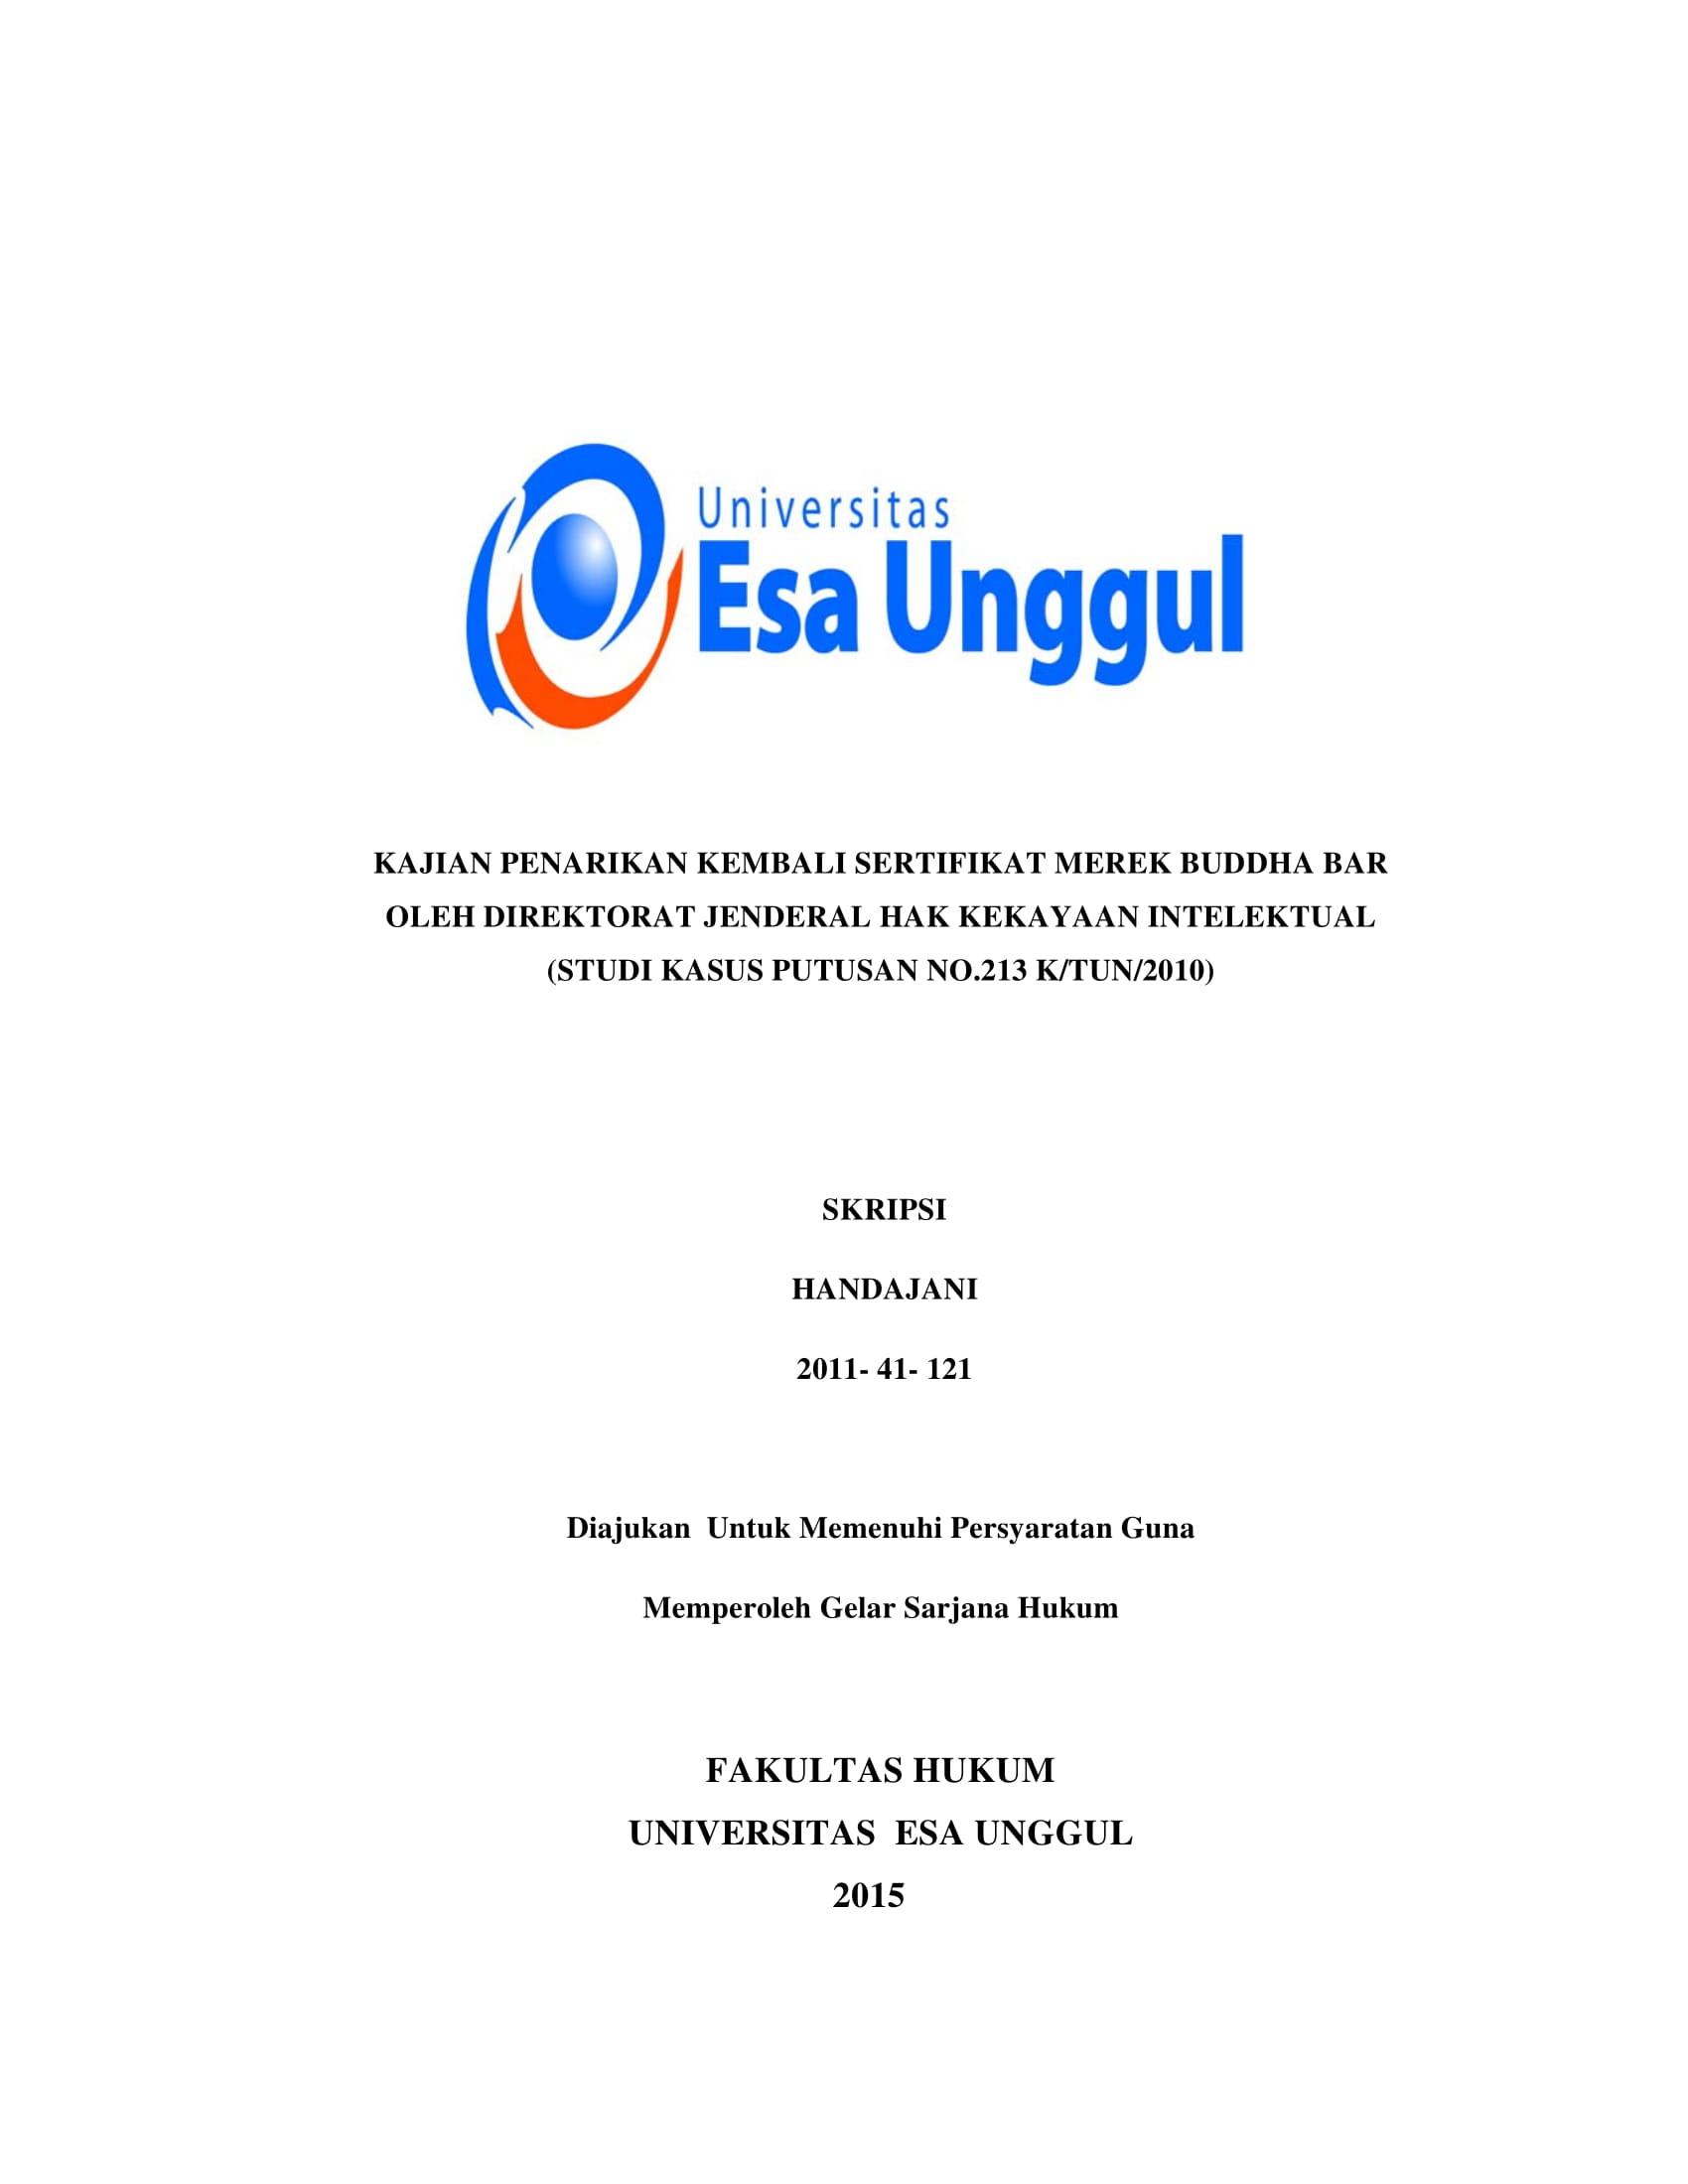 Kajian Penarikan Kembali Sertifikat Merek Buddha Bar oleh Direktorat Jenderal Hak Kekayaan Intelektual (Studi Kasus Putusan No. 213/K/TUN/2010)